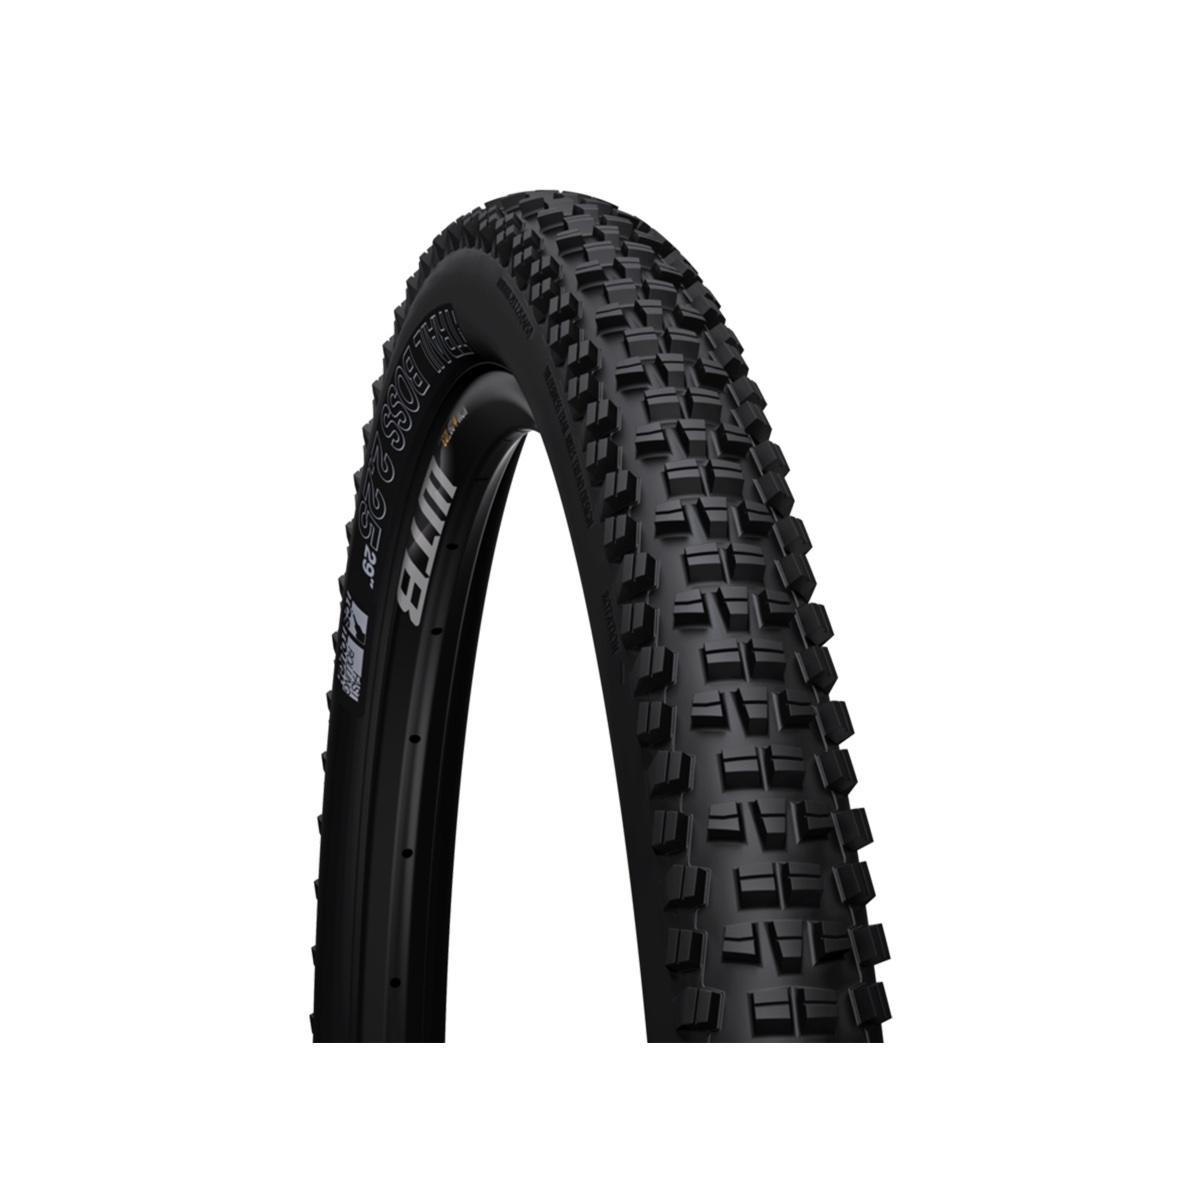 "WTB Trail Boss Tough/Fast Rolling Tire 2.25 x 29"""